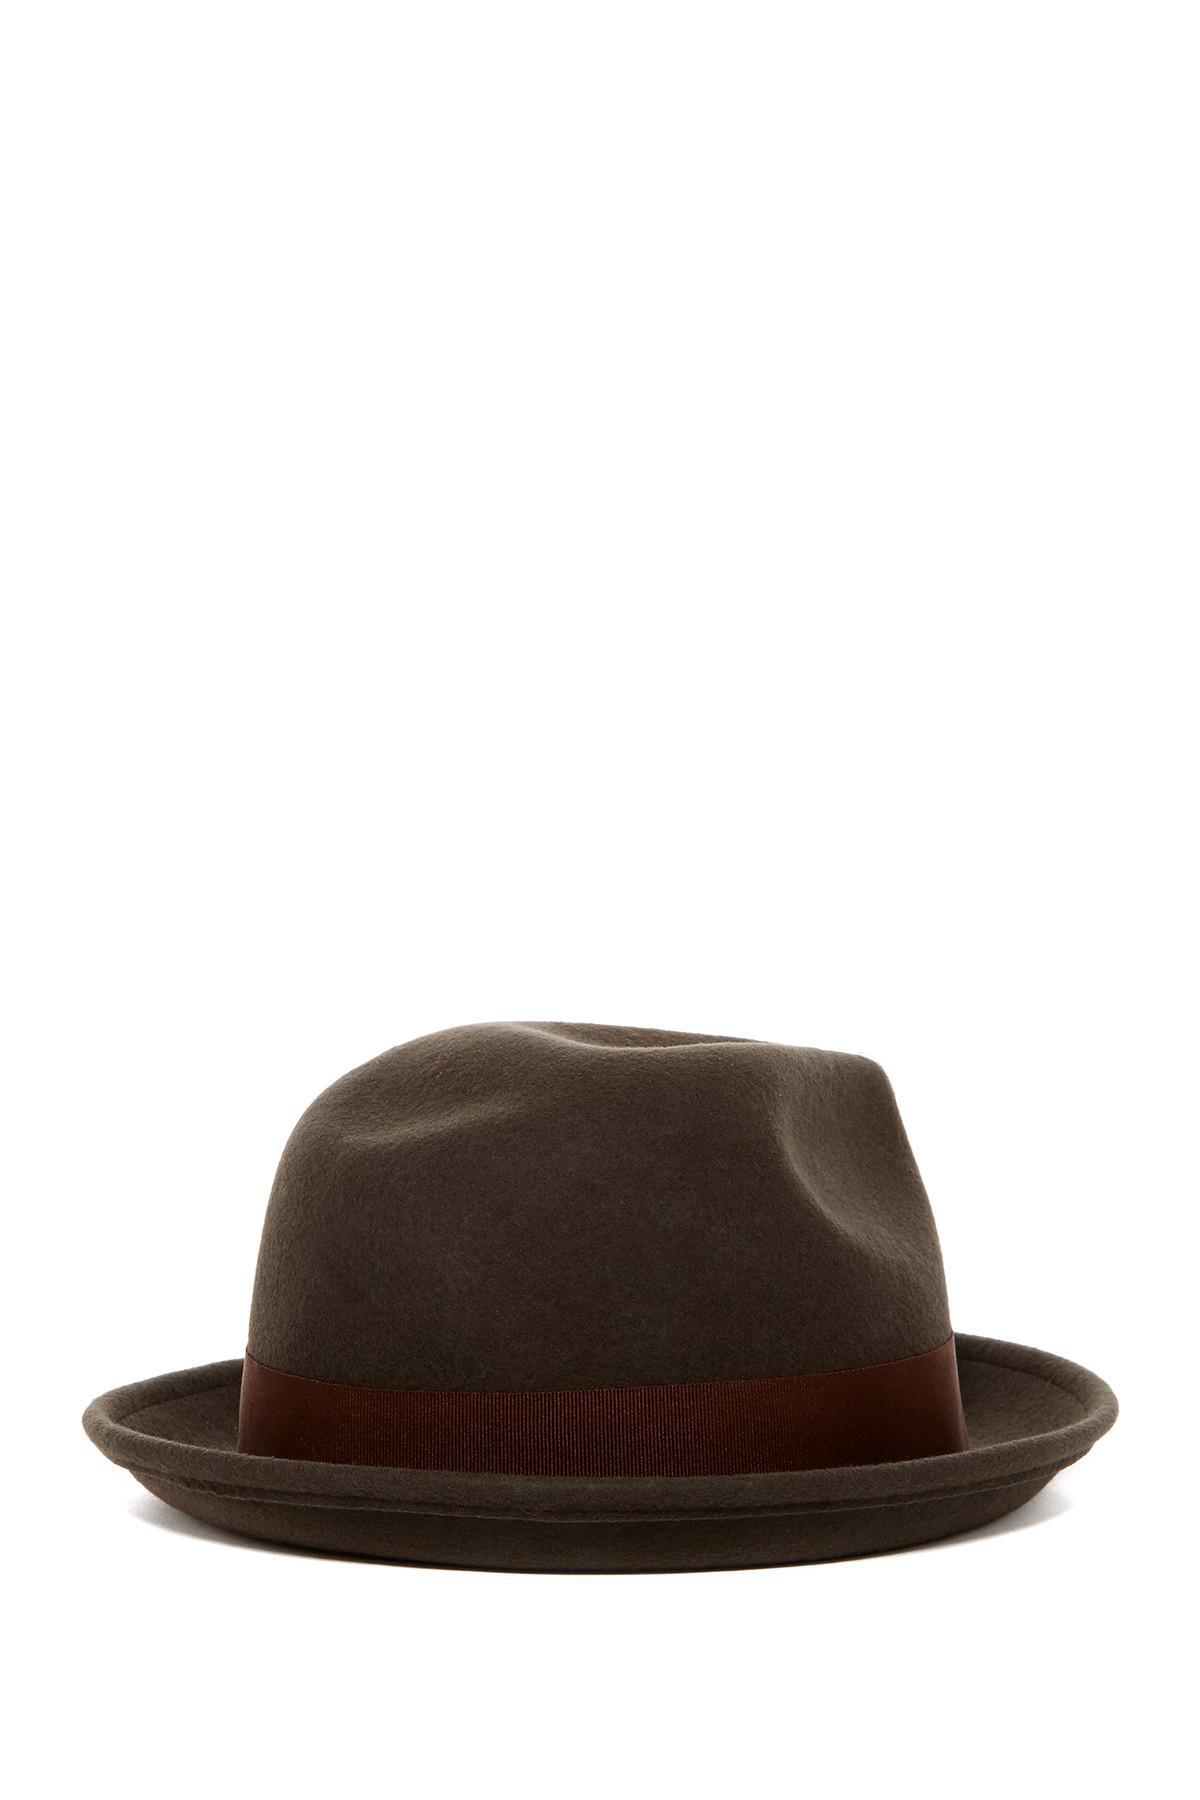 0610d7c08b2f6d Lyst - Goorin Bros Rude Boy Wool Fedora in Brown for Men